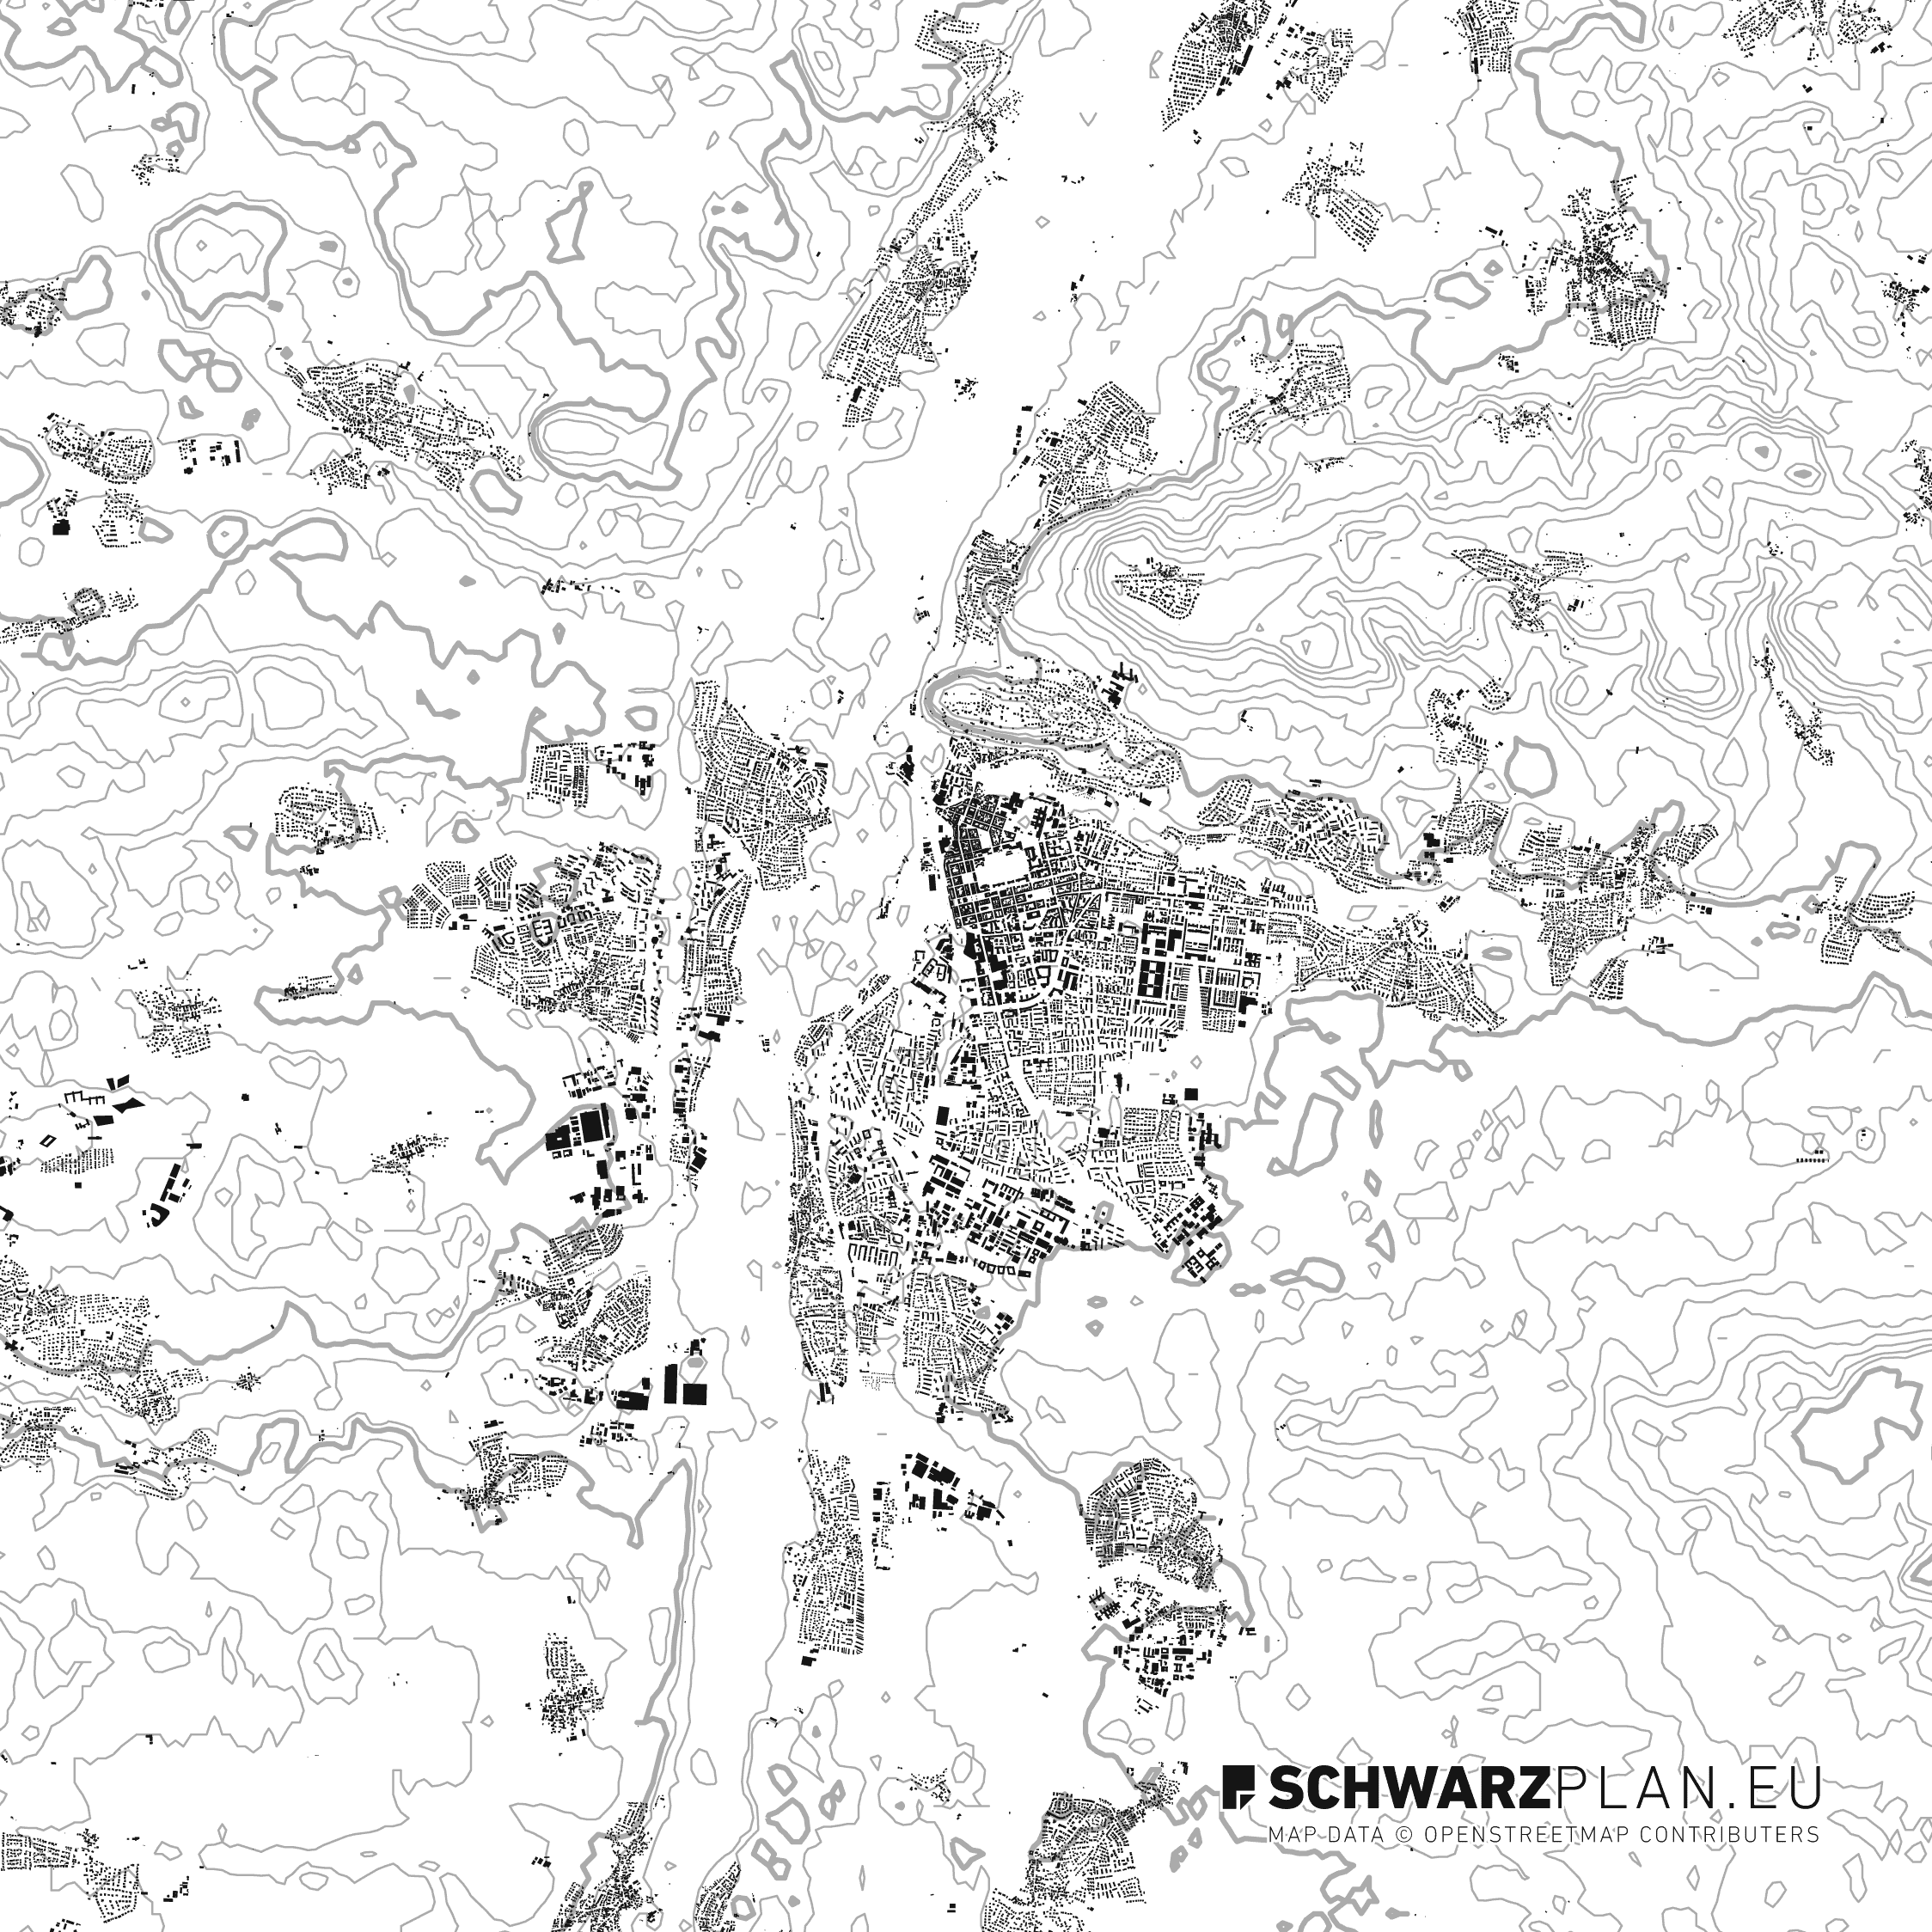 Figure Ground Plan of Erlangen